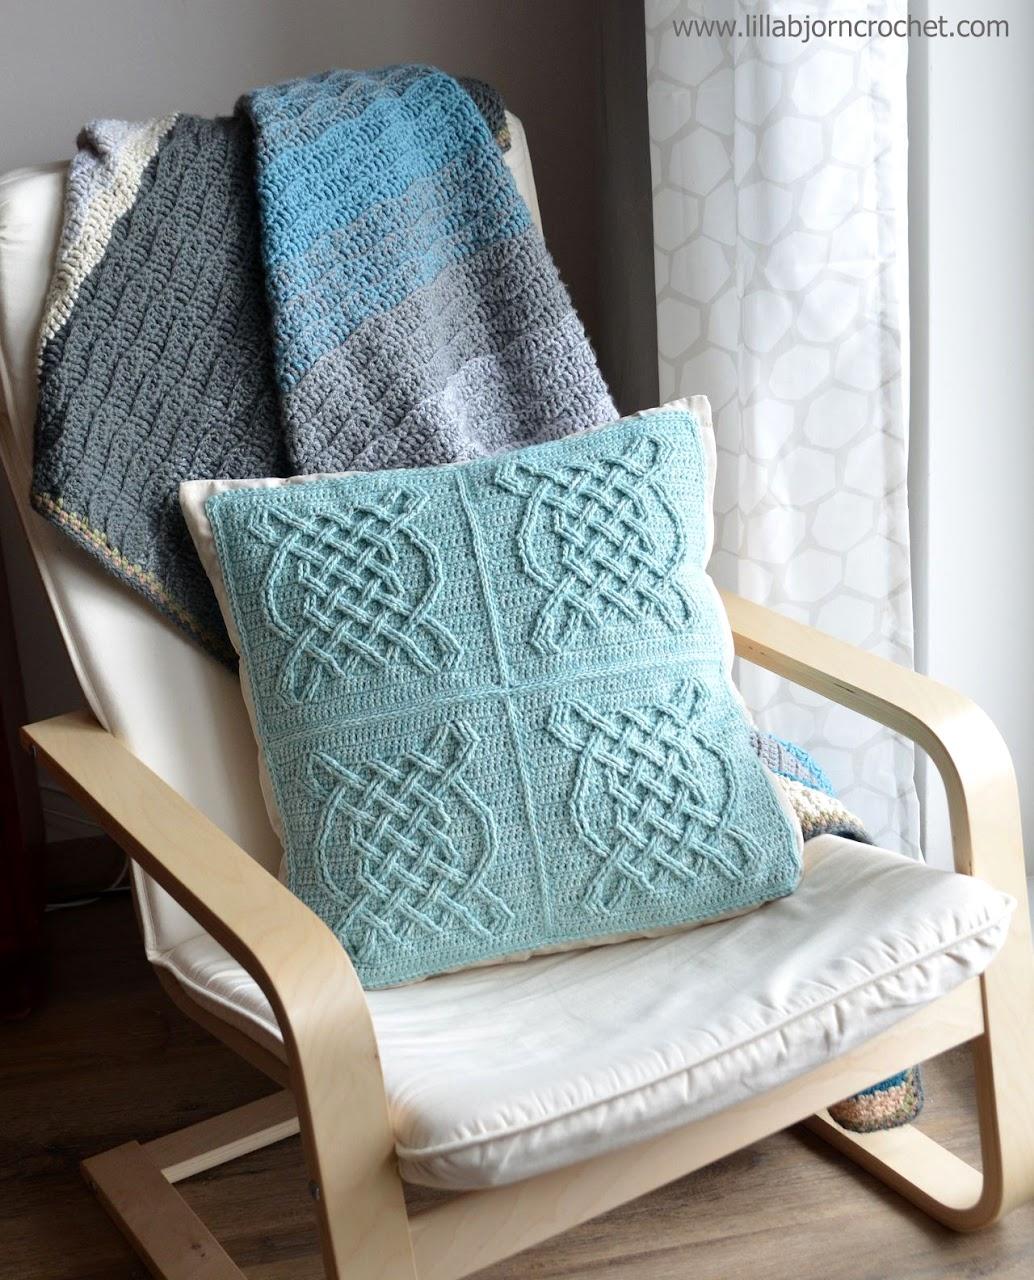 Celtic Tiles pillow - FREE overlay crochet pattern by Lilla Bjorn